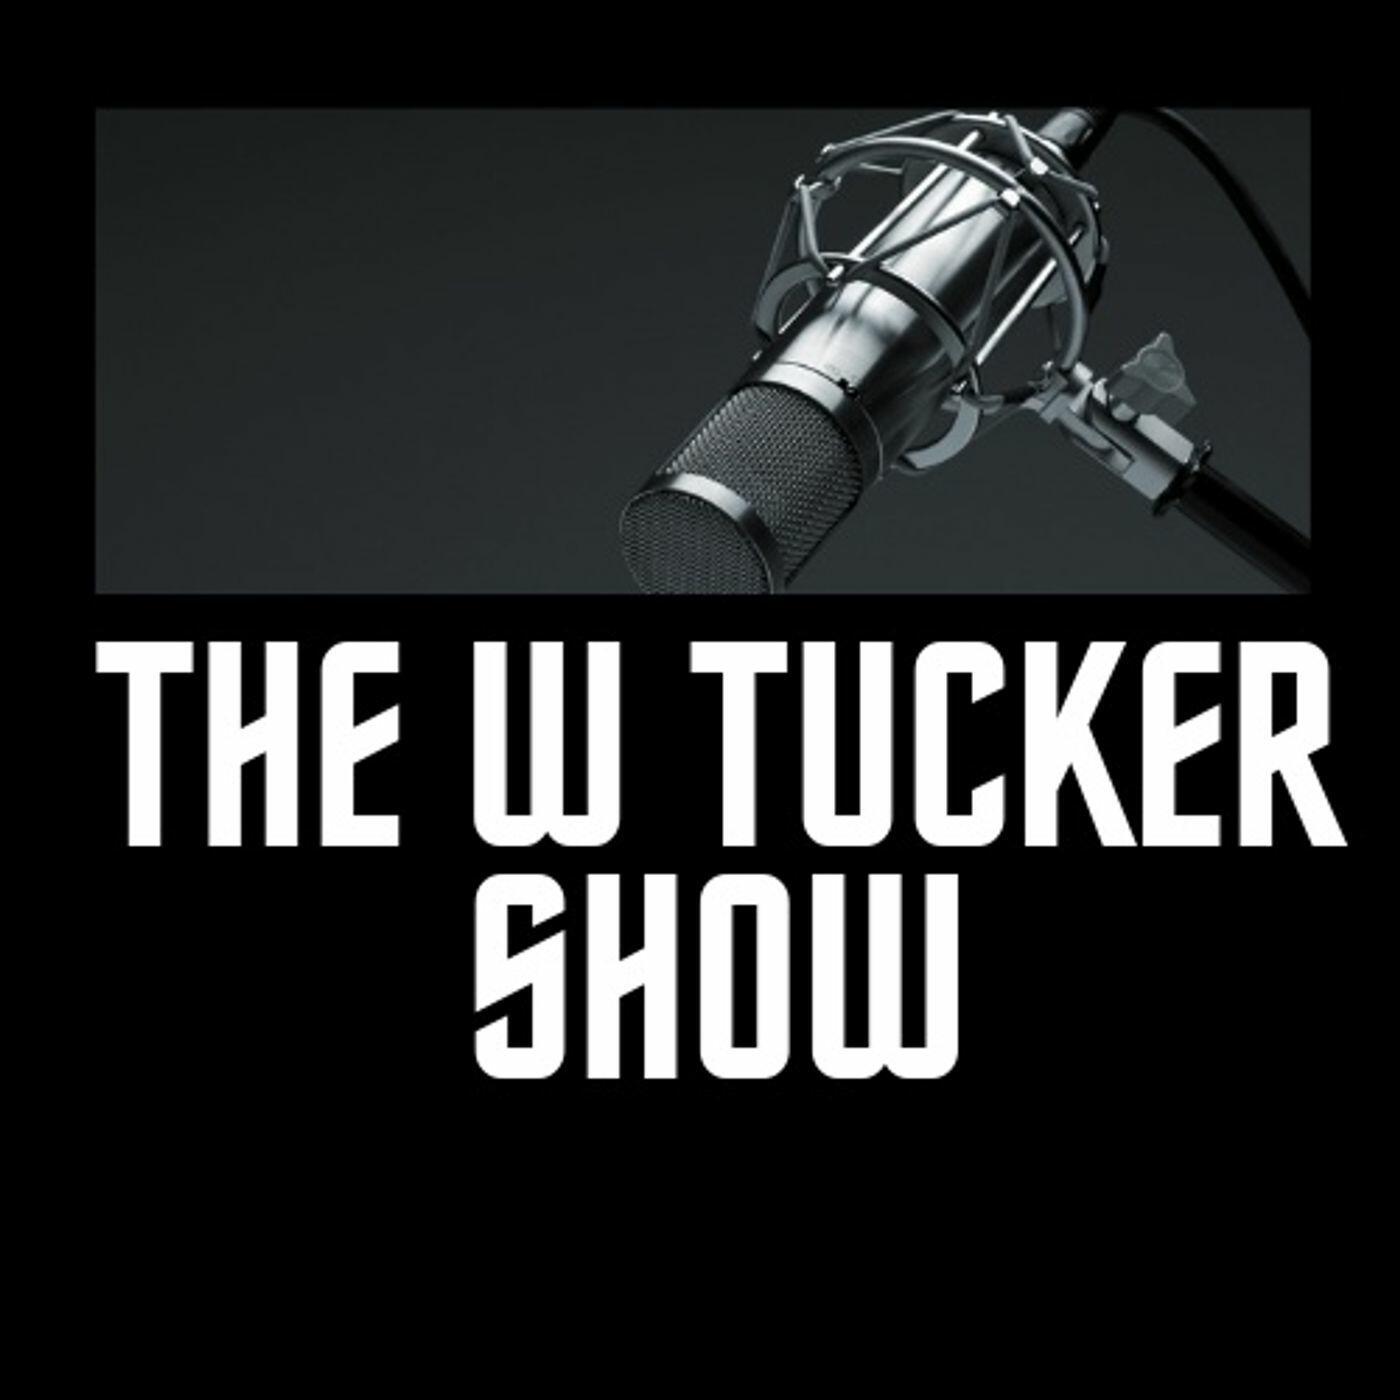 The W Tucker Show